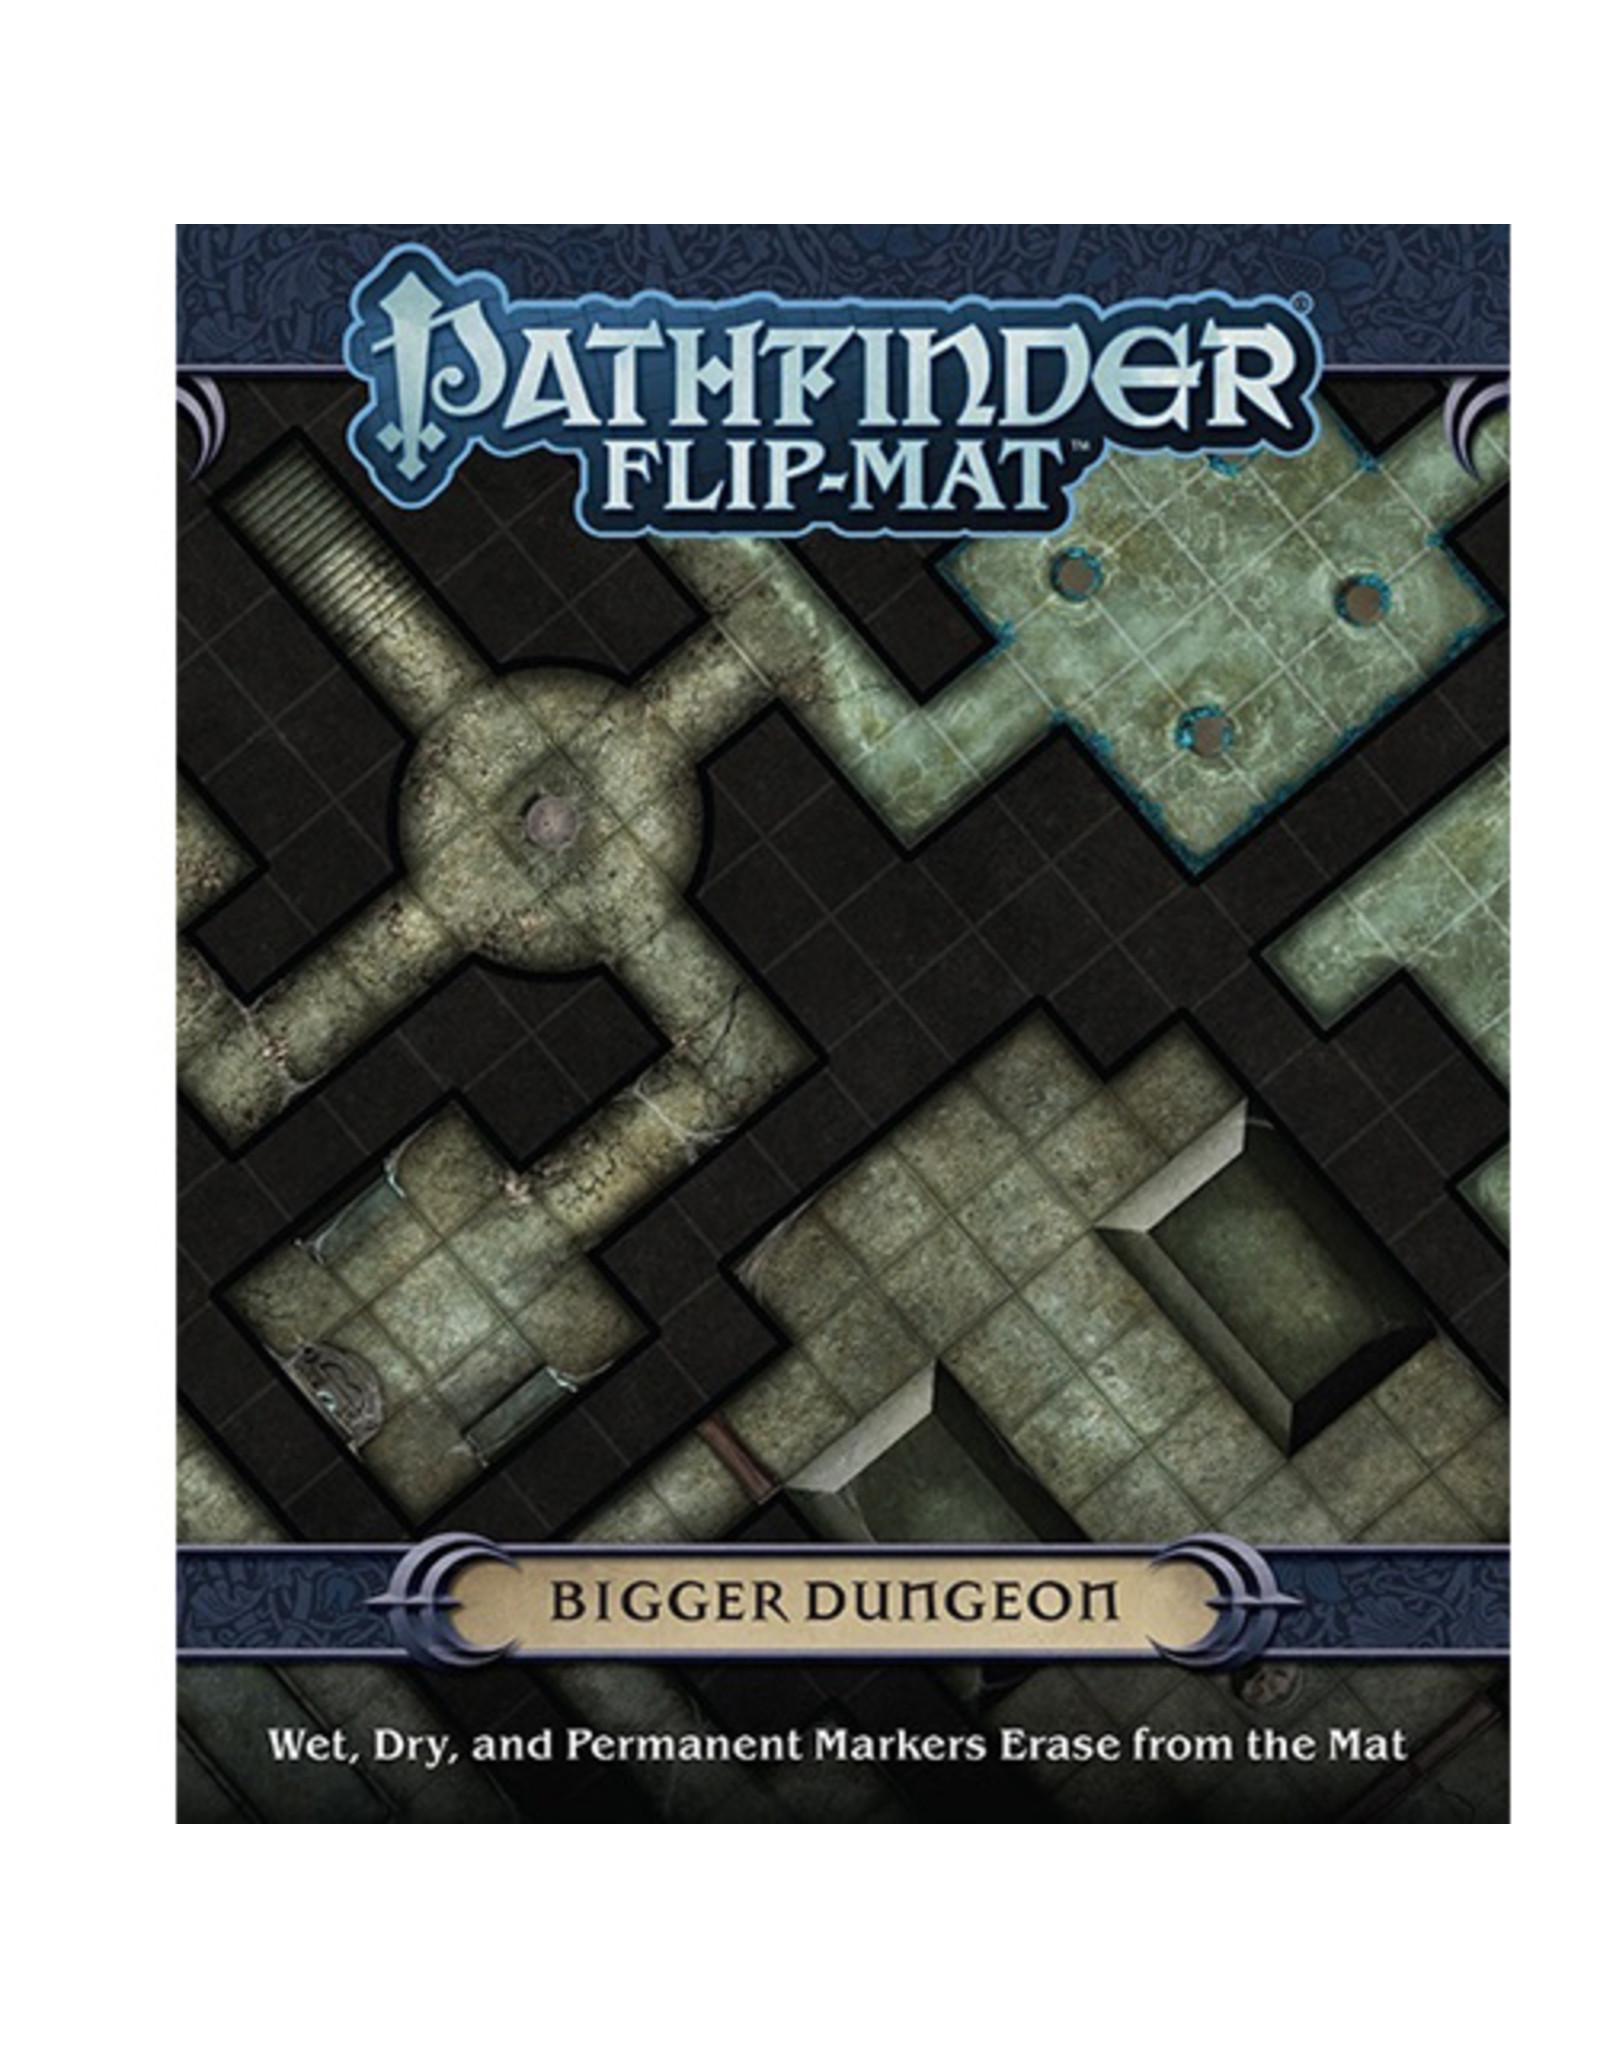 Pathfinder RPG: Flip-Mat - Bigger Dungeon